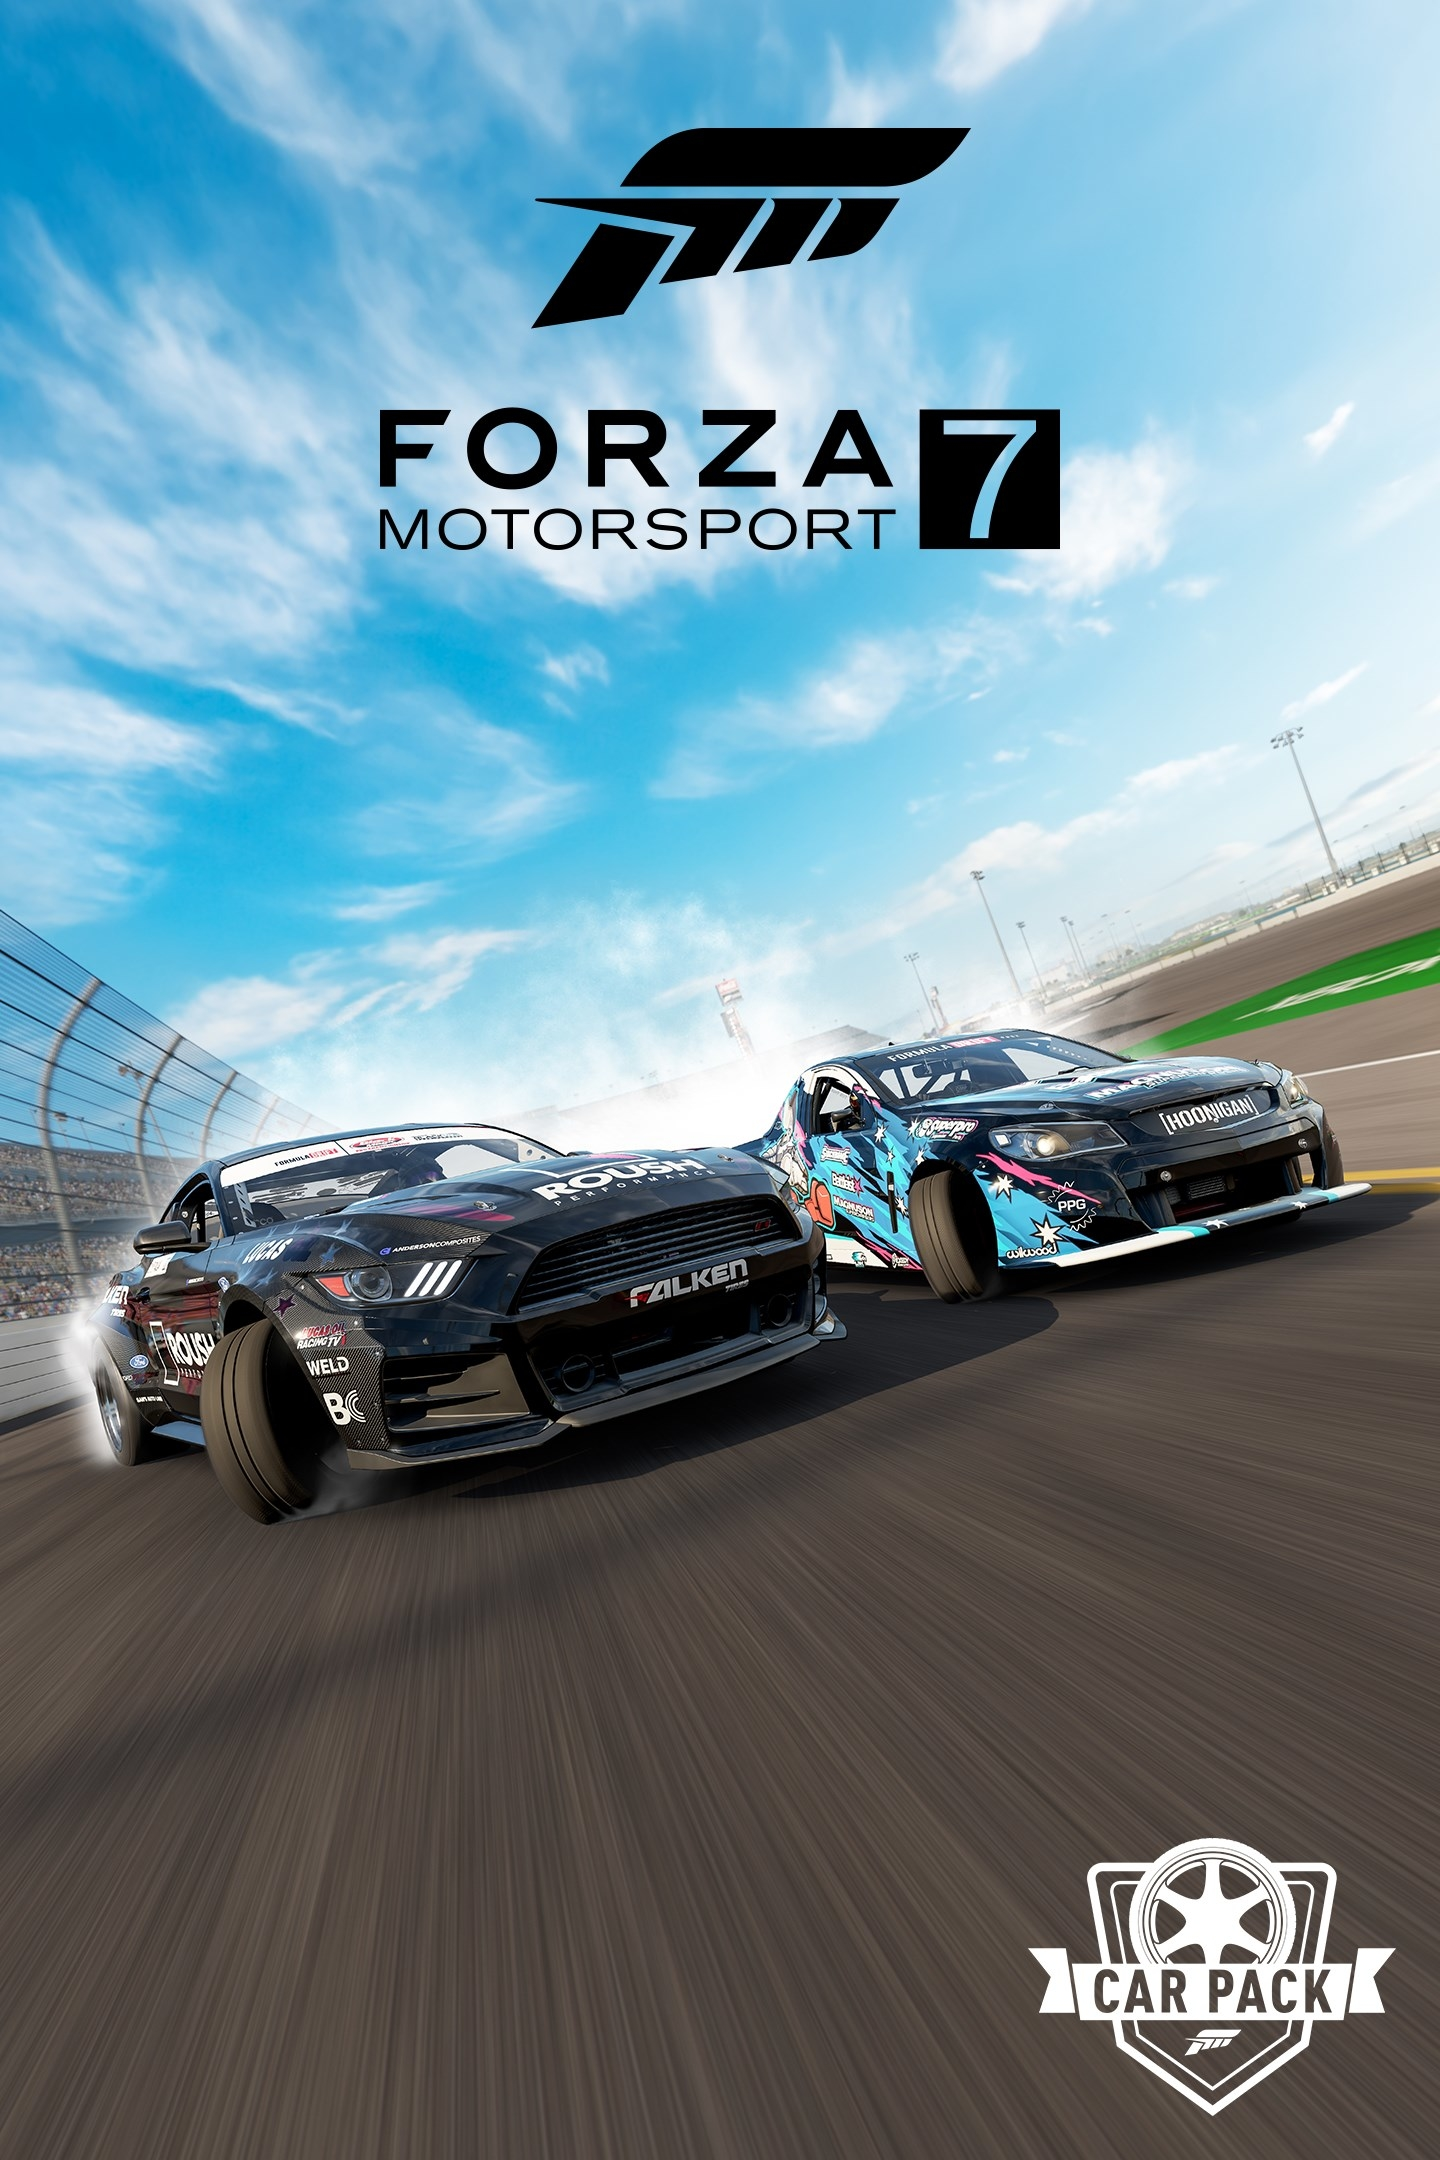 Forza Motorsport 7/Formula Drift Car Pack